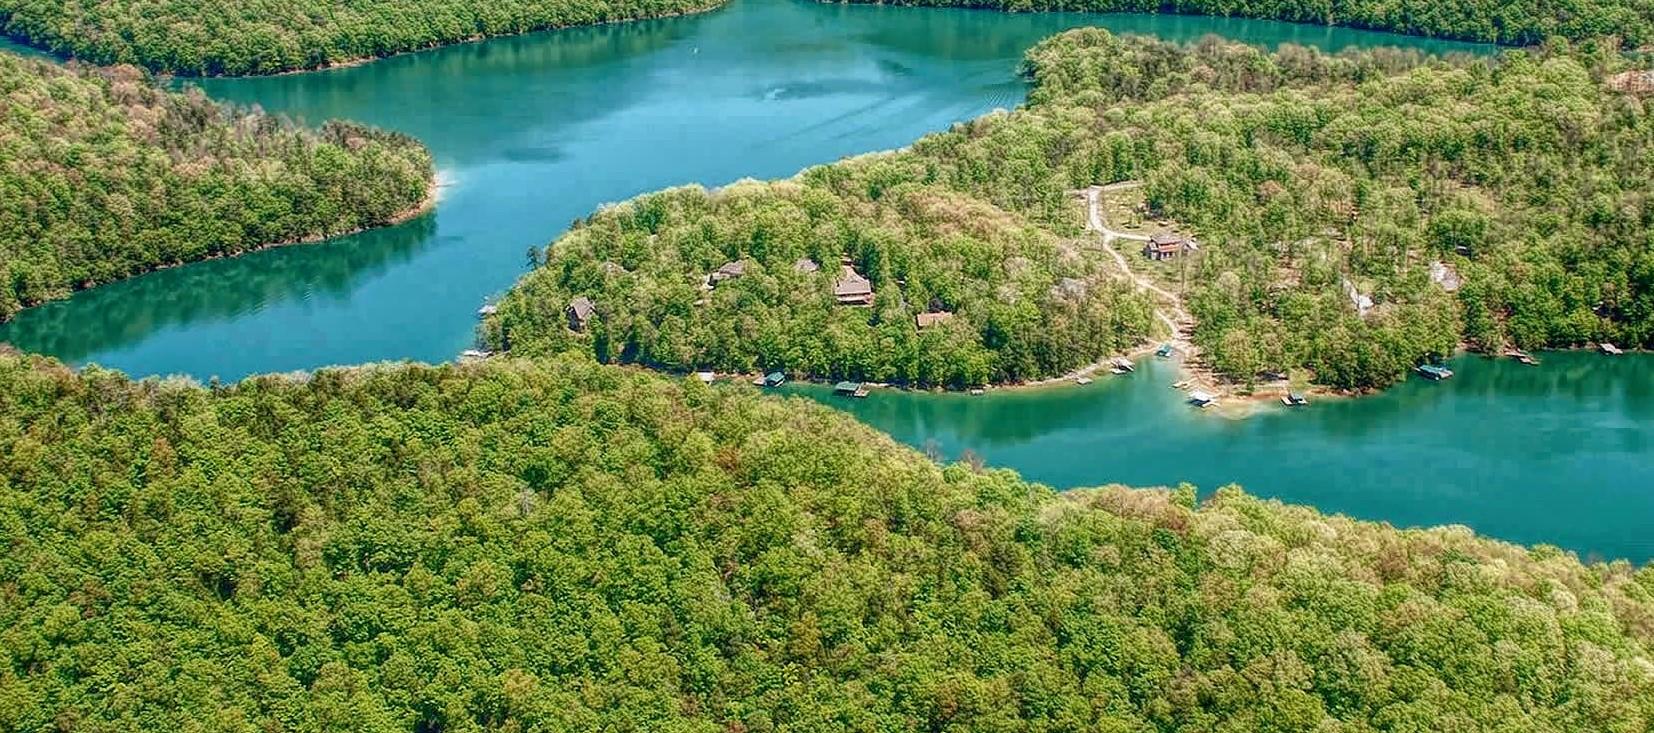 Cove Norris - Norris Lake - Caryville TN